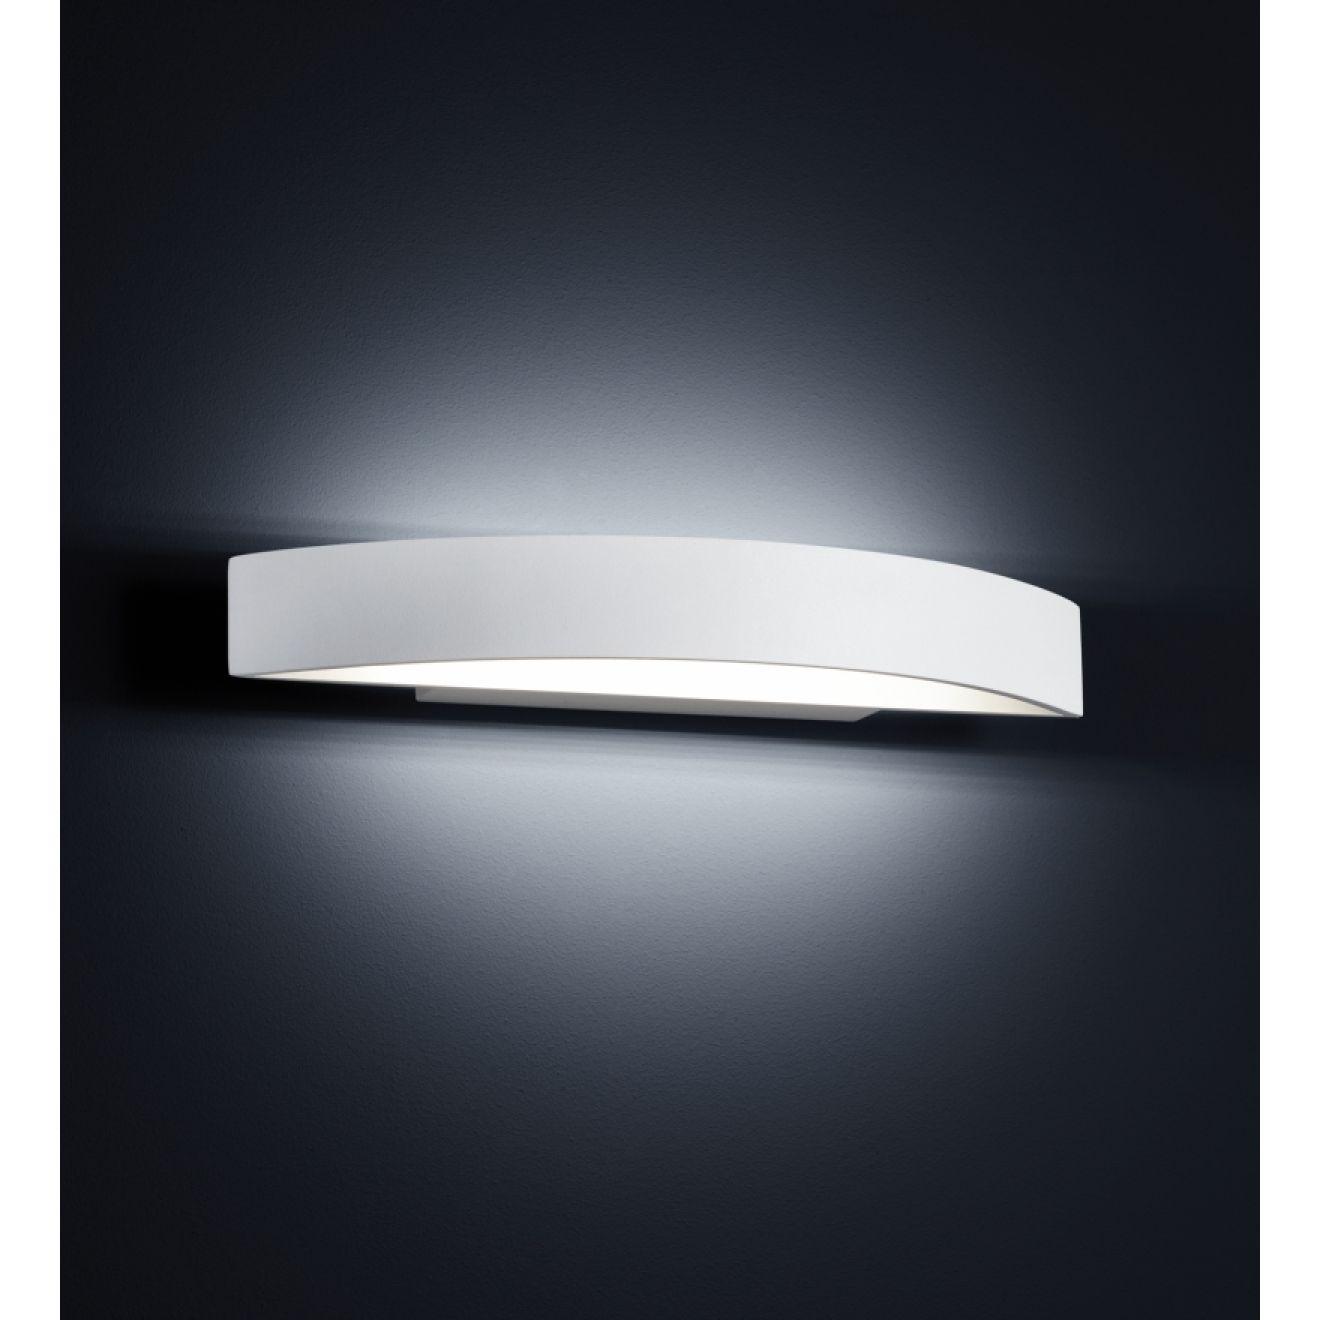 yona wandlampe helestra 18w weiss 38. Black Bedroom Furniture Sets. Home Design Ideas